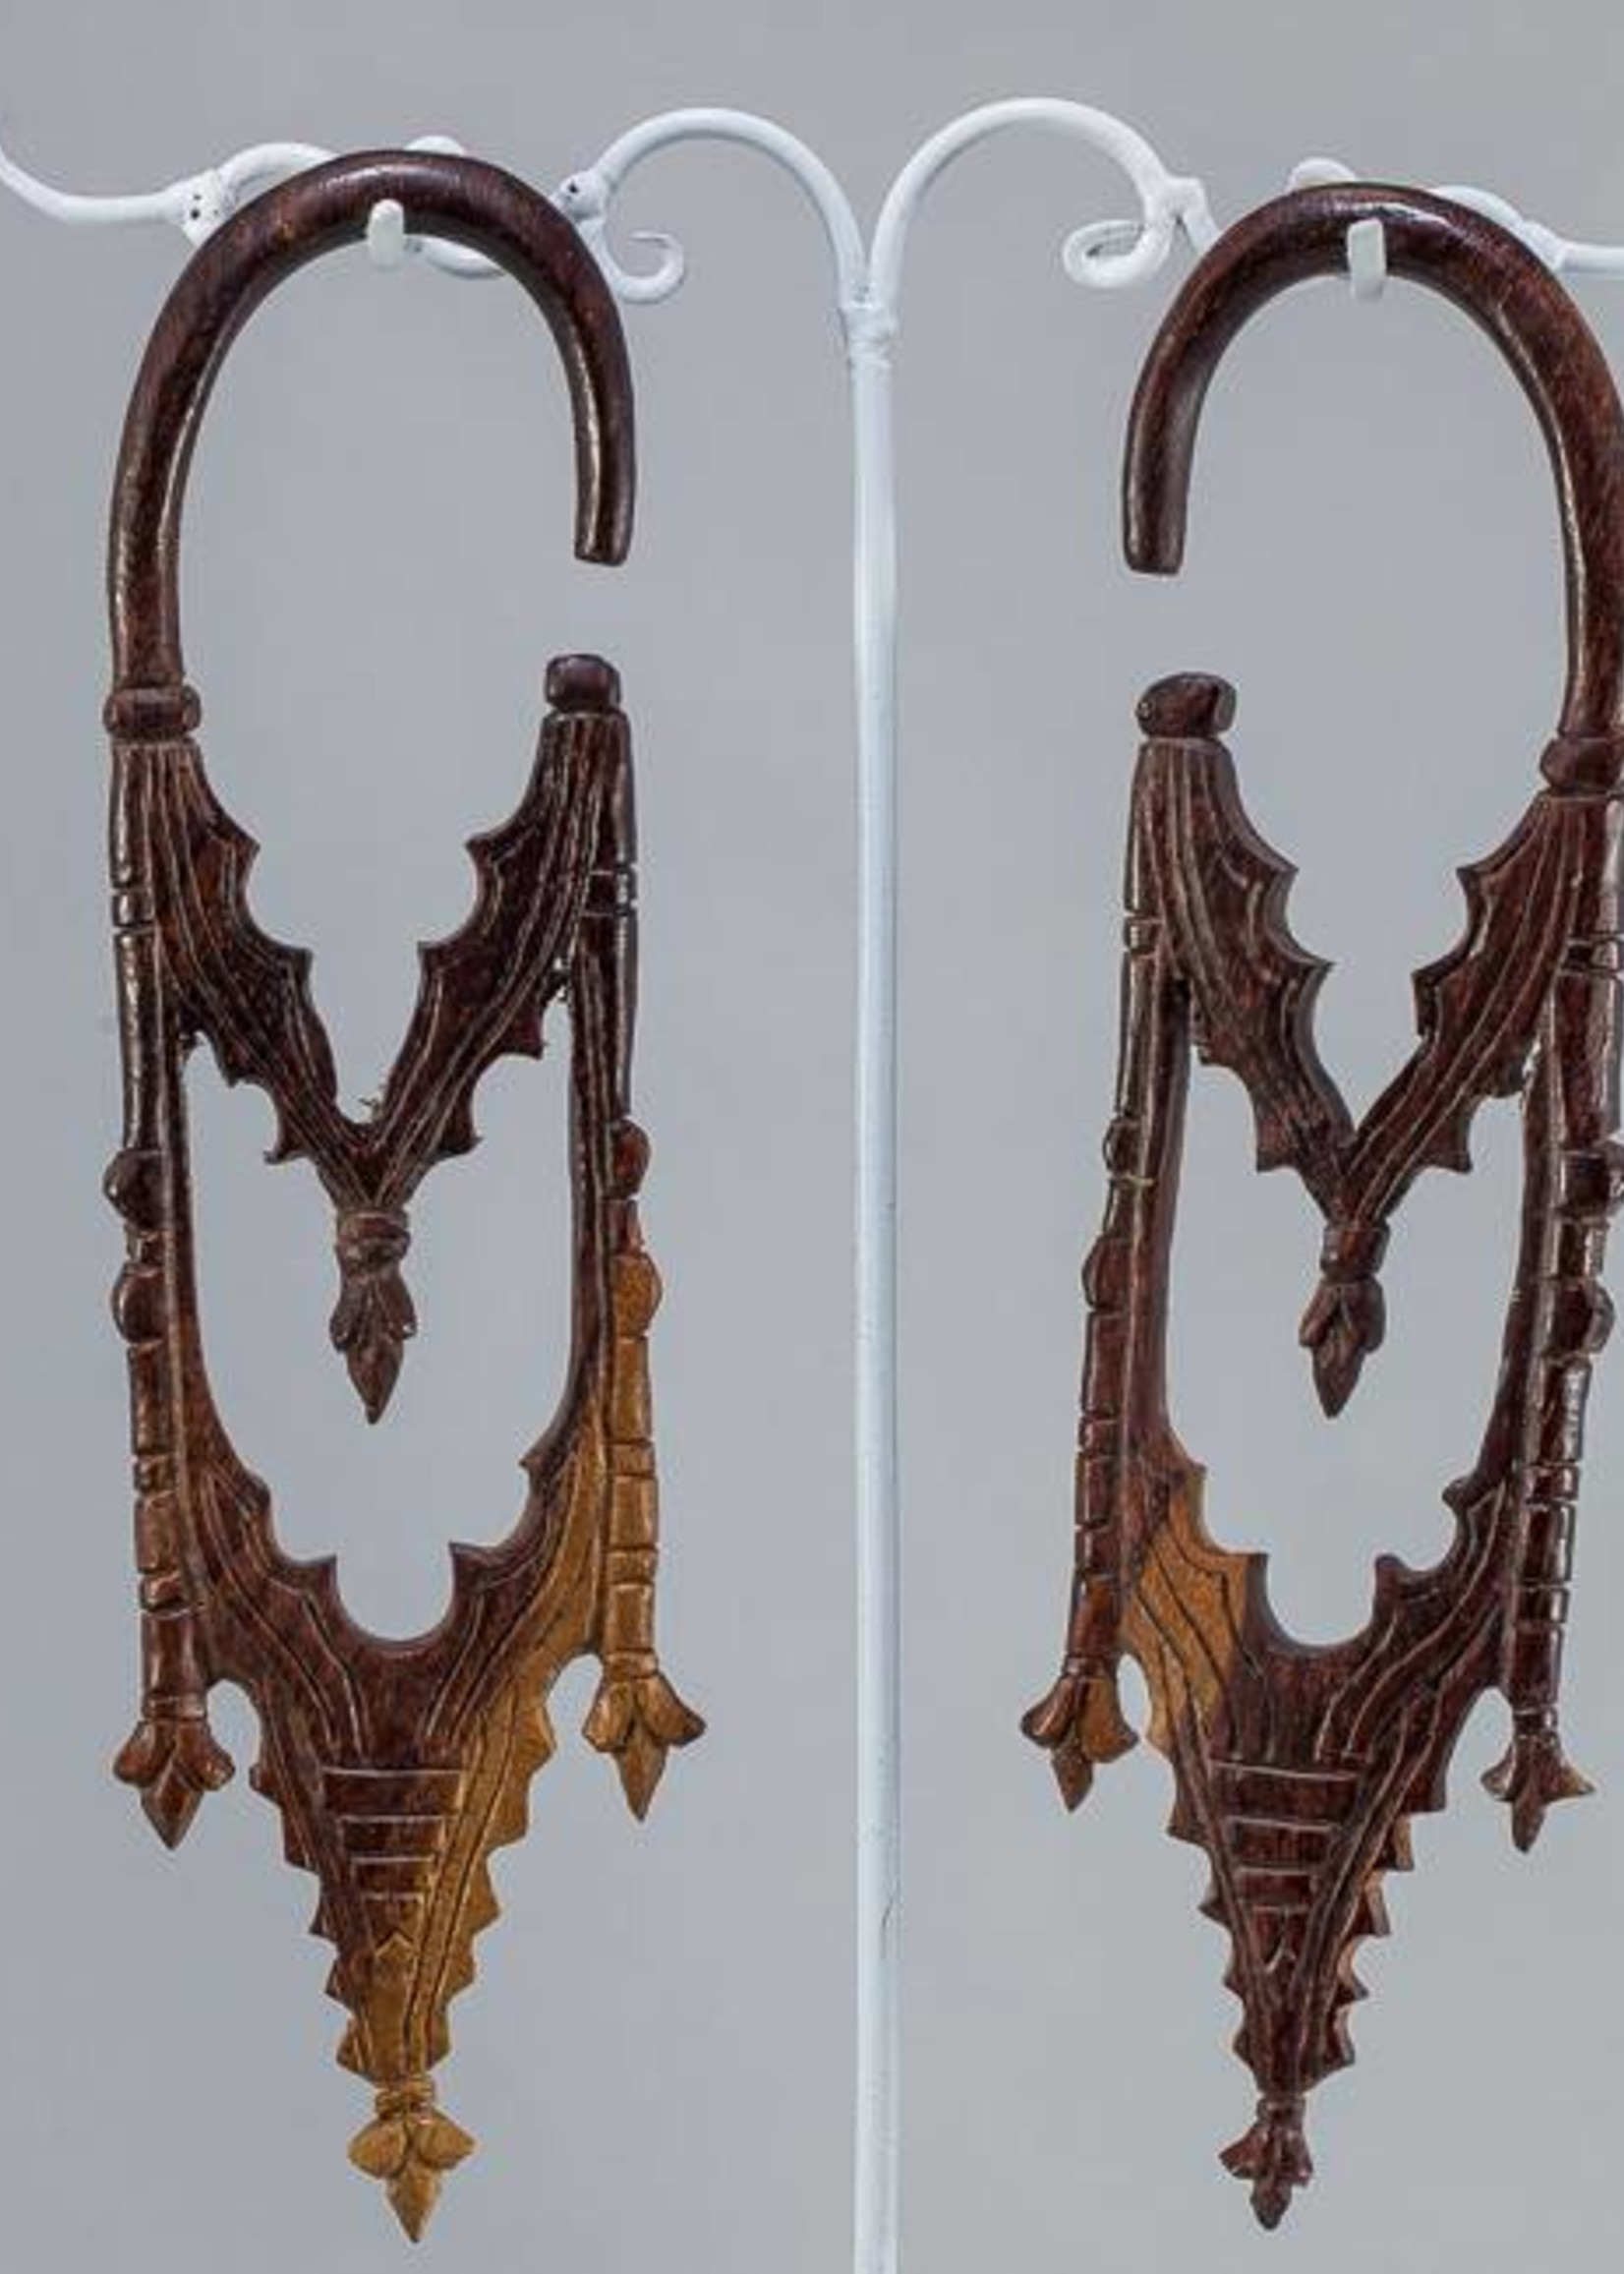 2g Ebony Gothic Cathedral Hangers